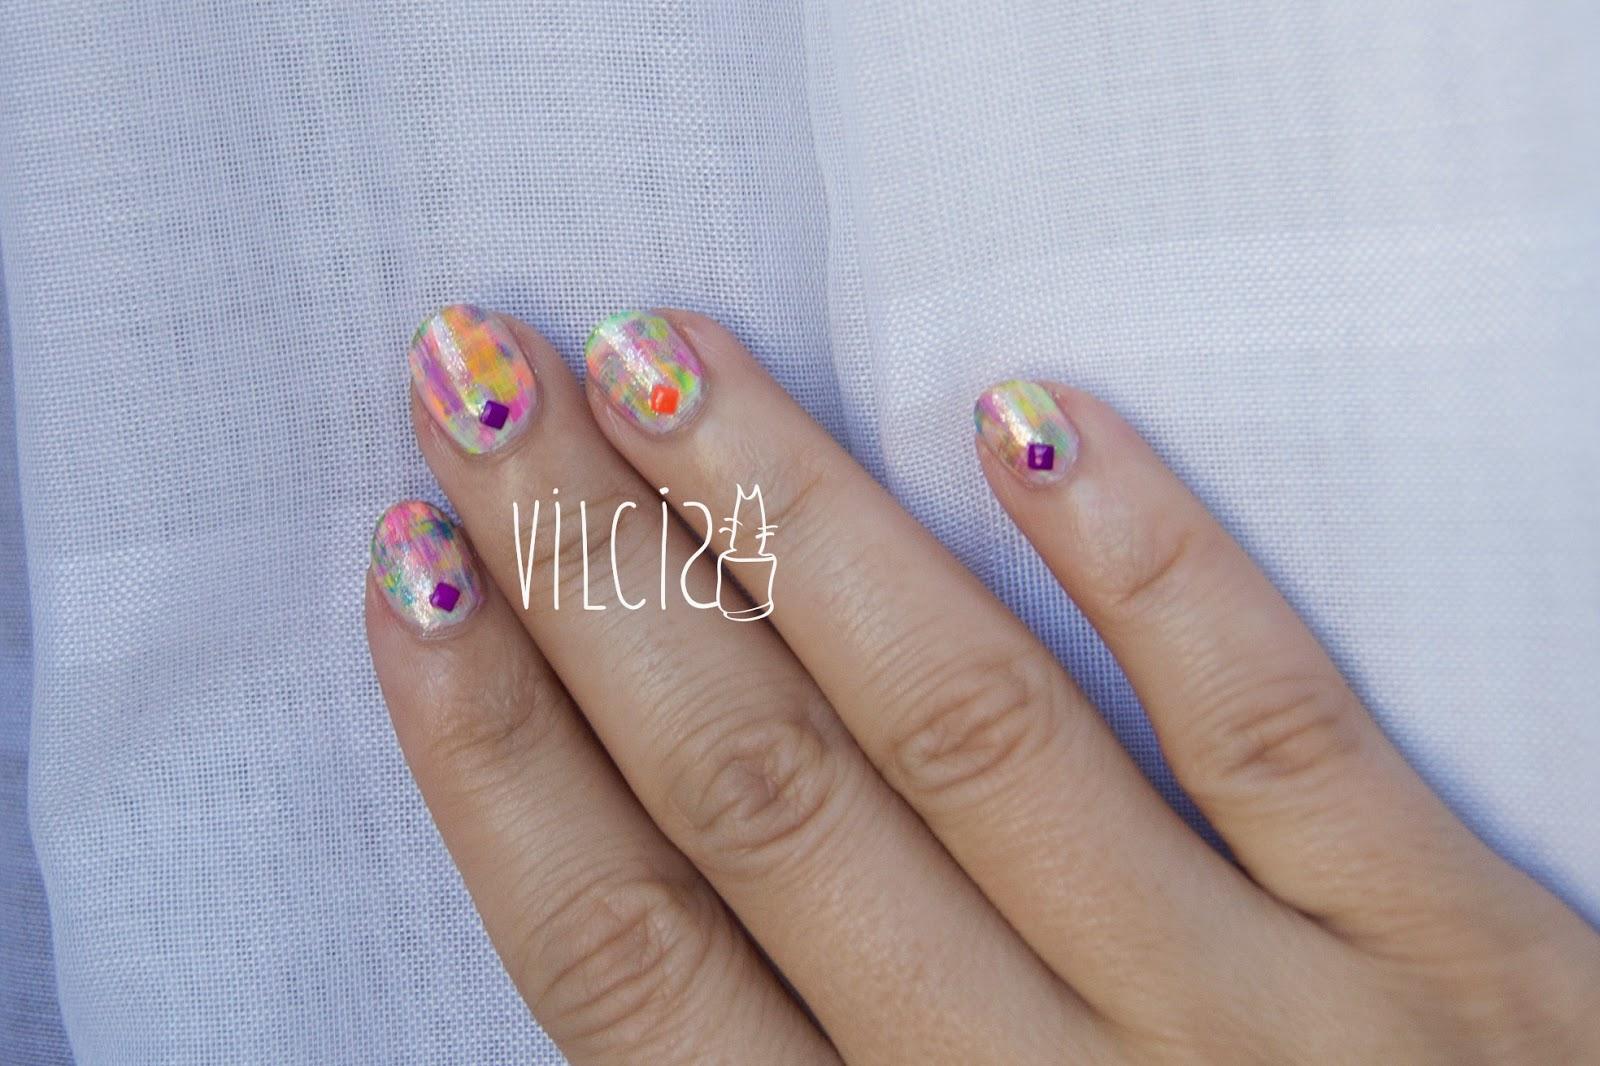 Diseño fácil uñas cortas neón tachuelas diseño a brochazos distressed nails vilcis